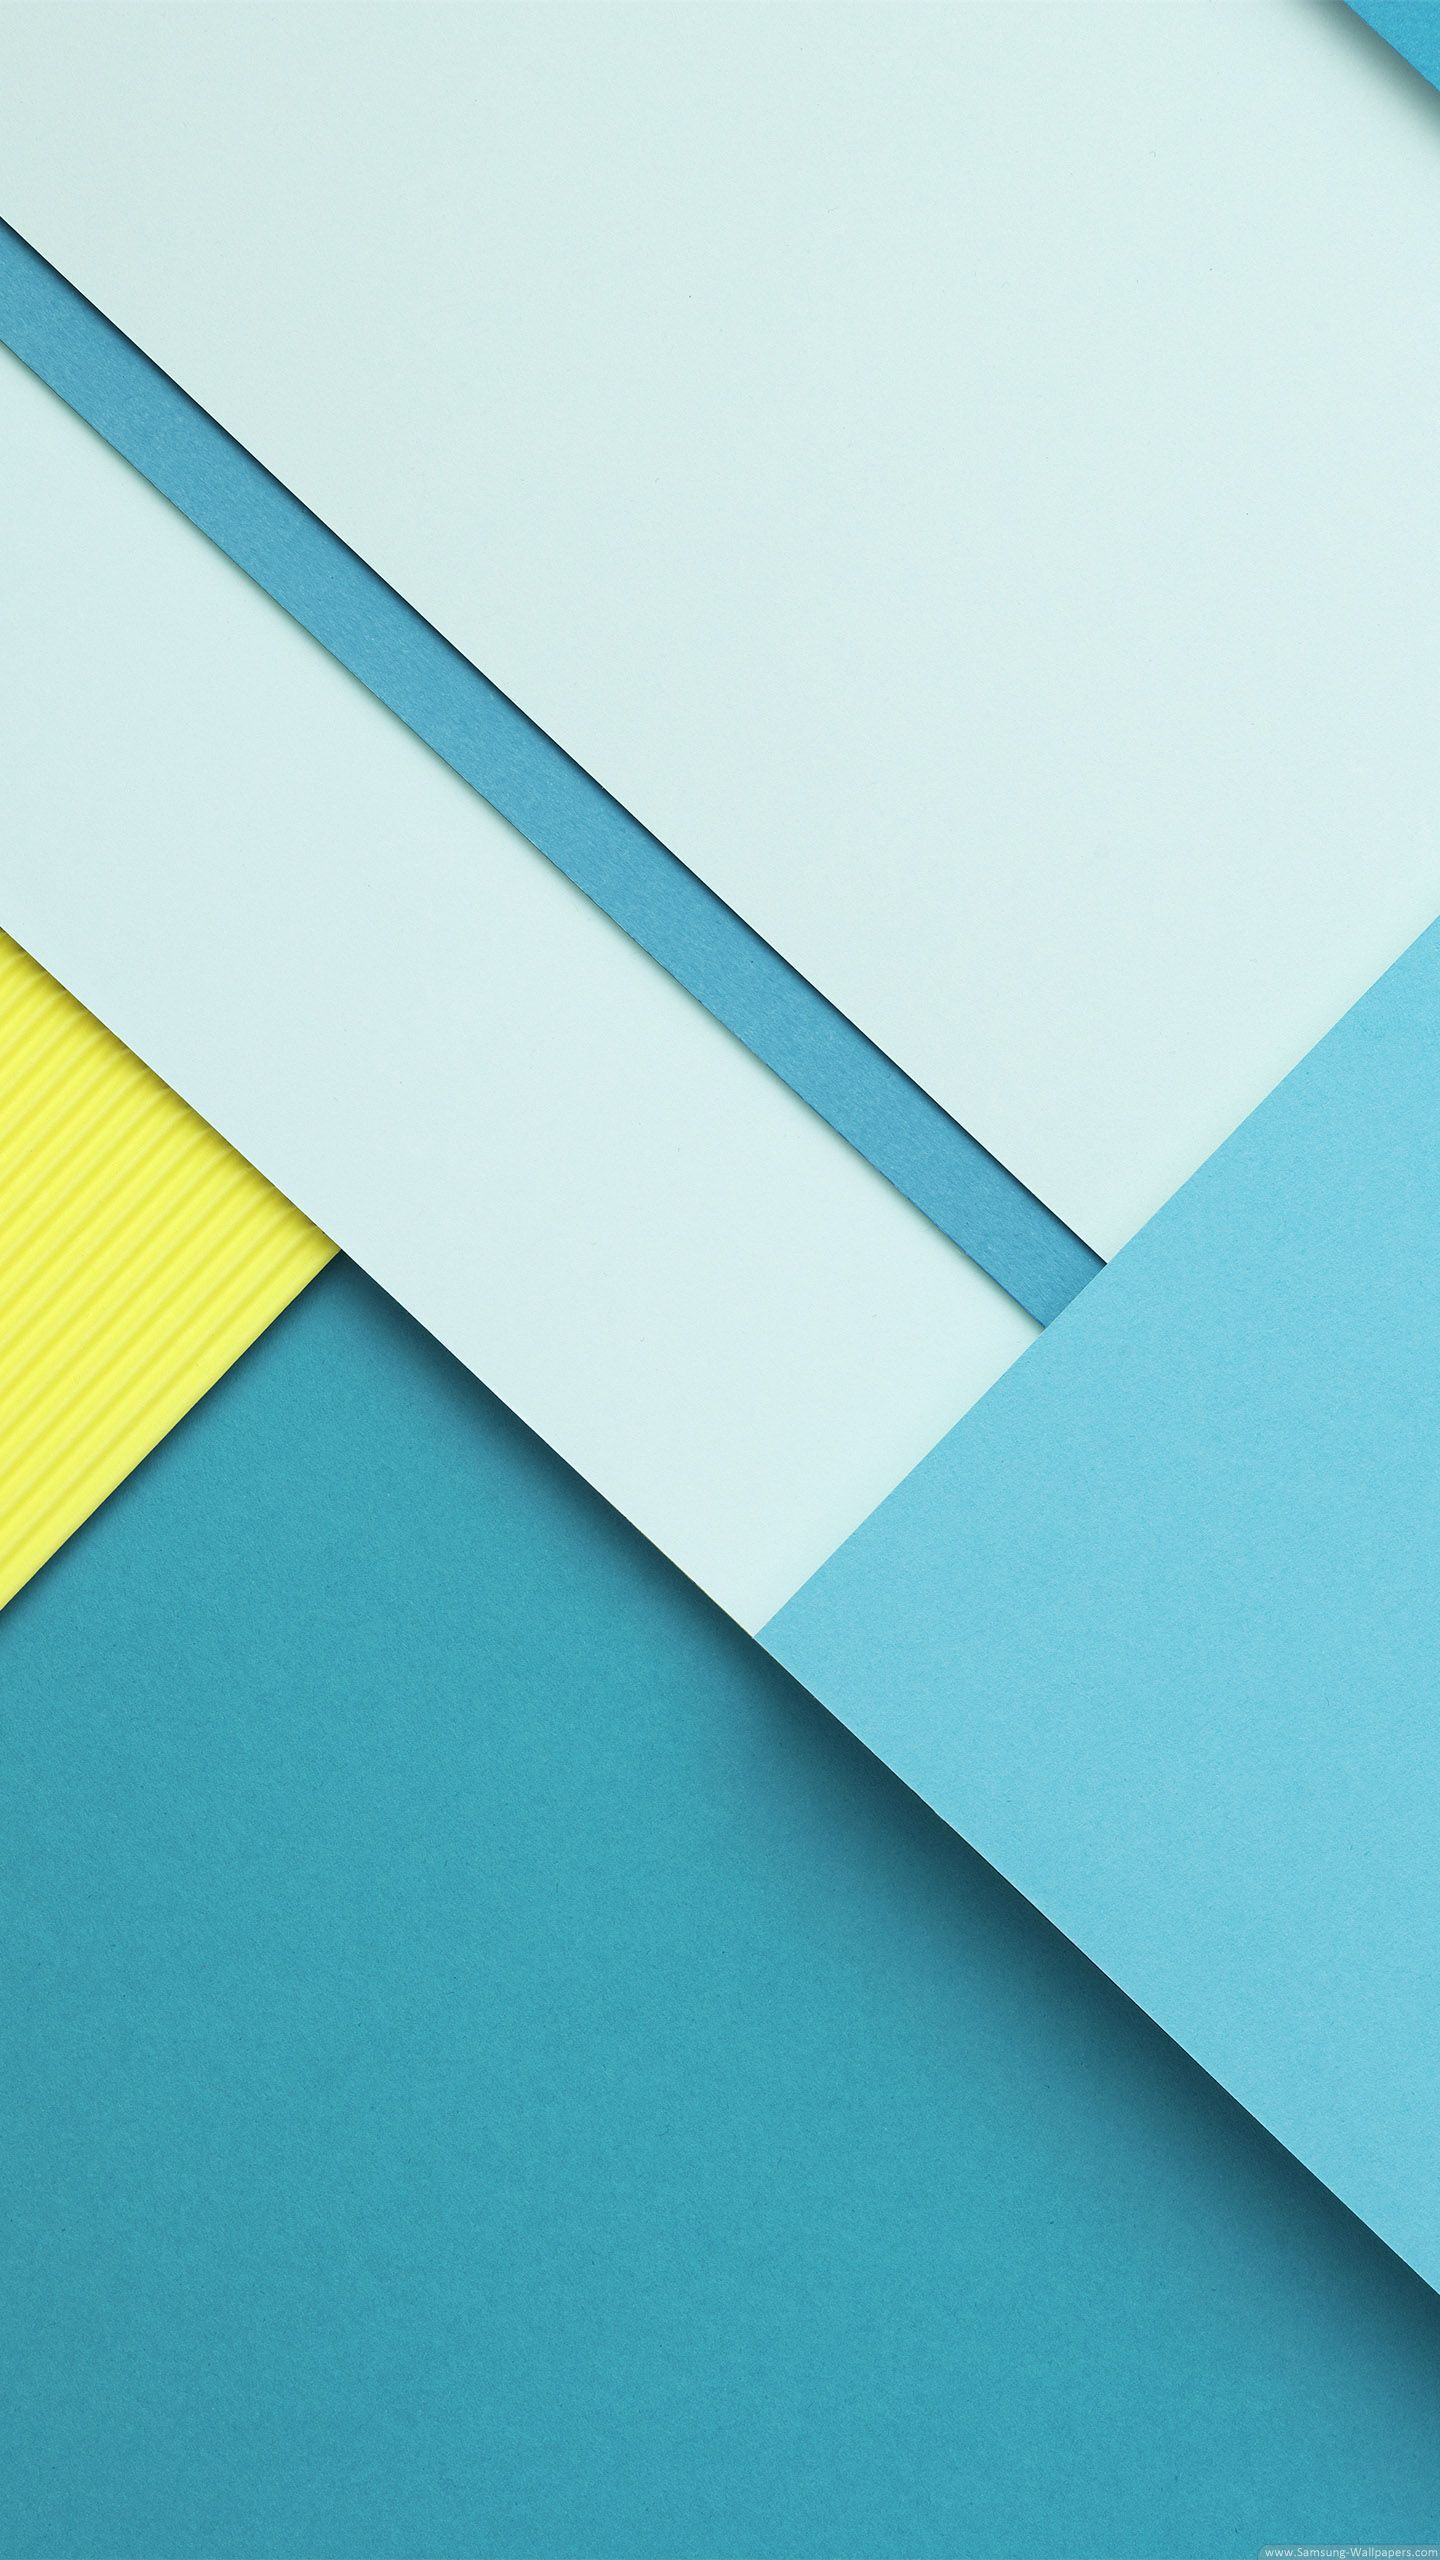 Kumpulan Wallpaper Android Nougat Hd Keren Galaxy note